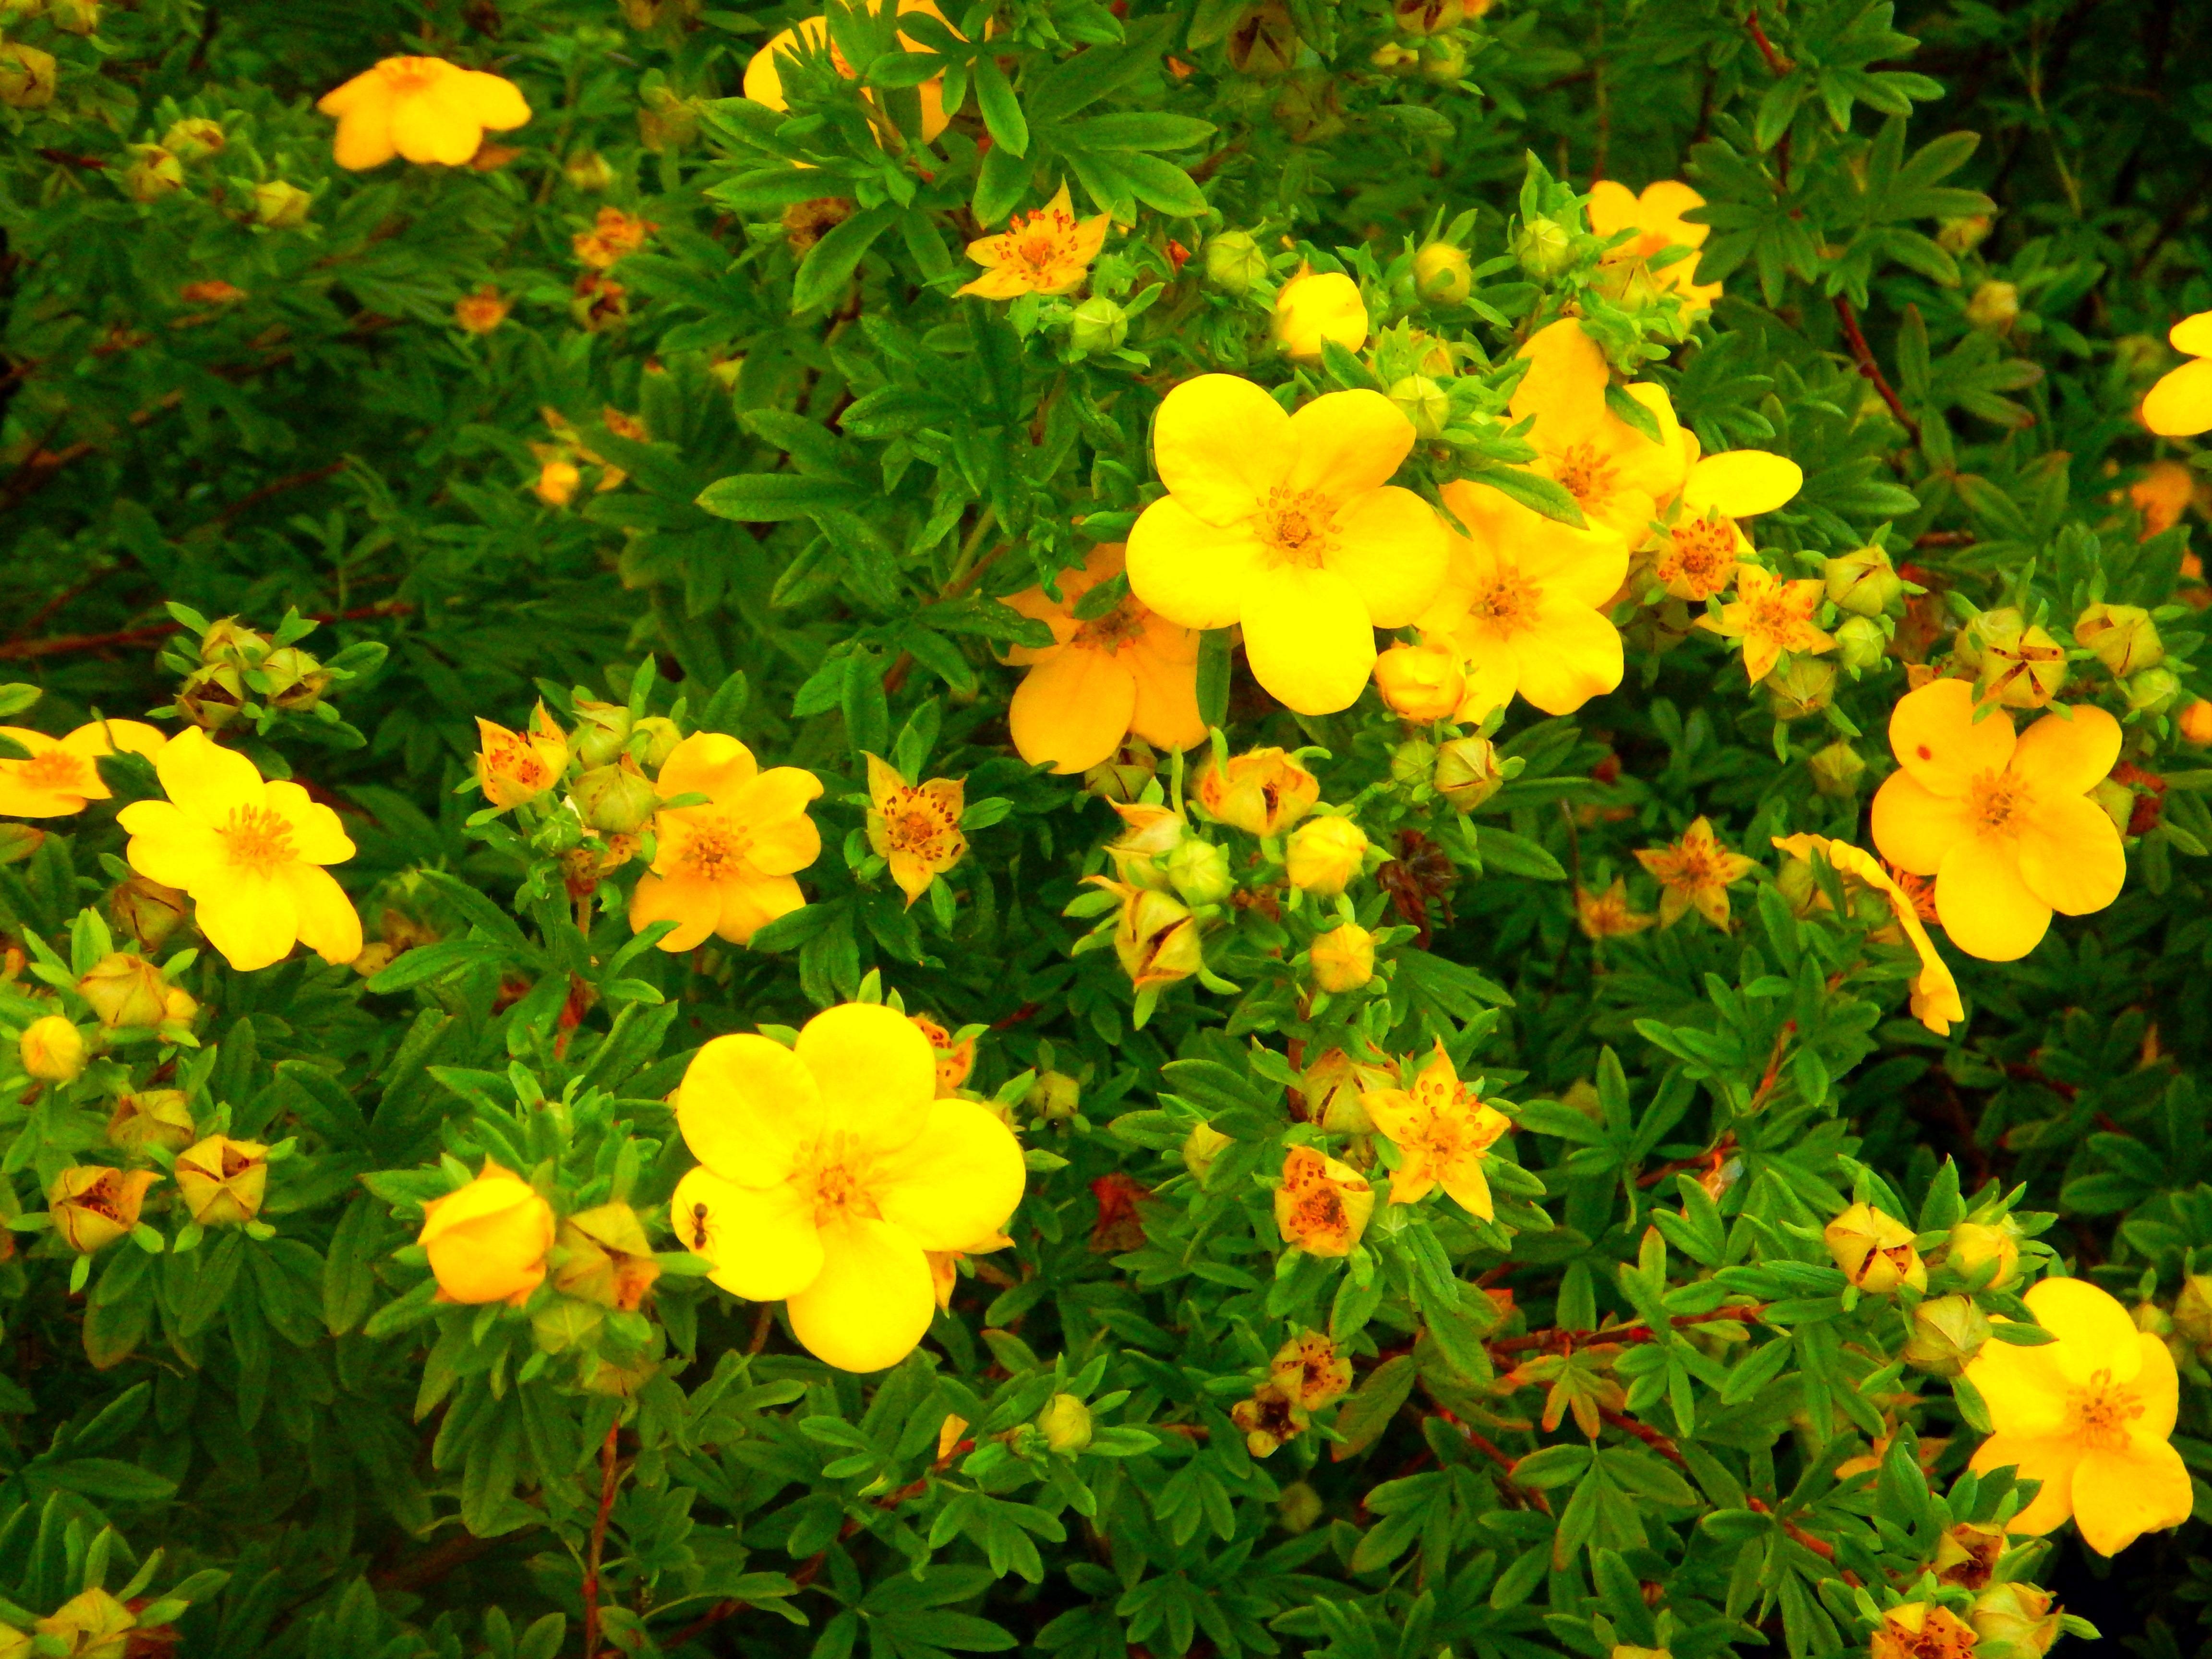 Желтая лапчатка: сорта, посадка и уход